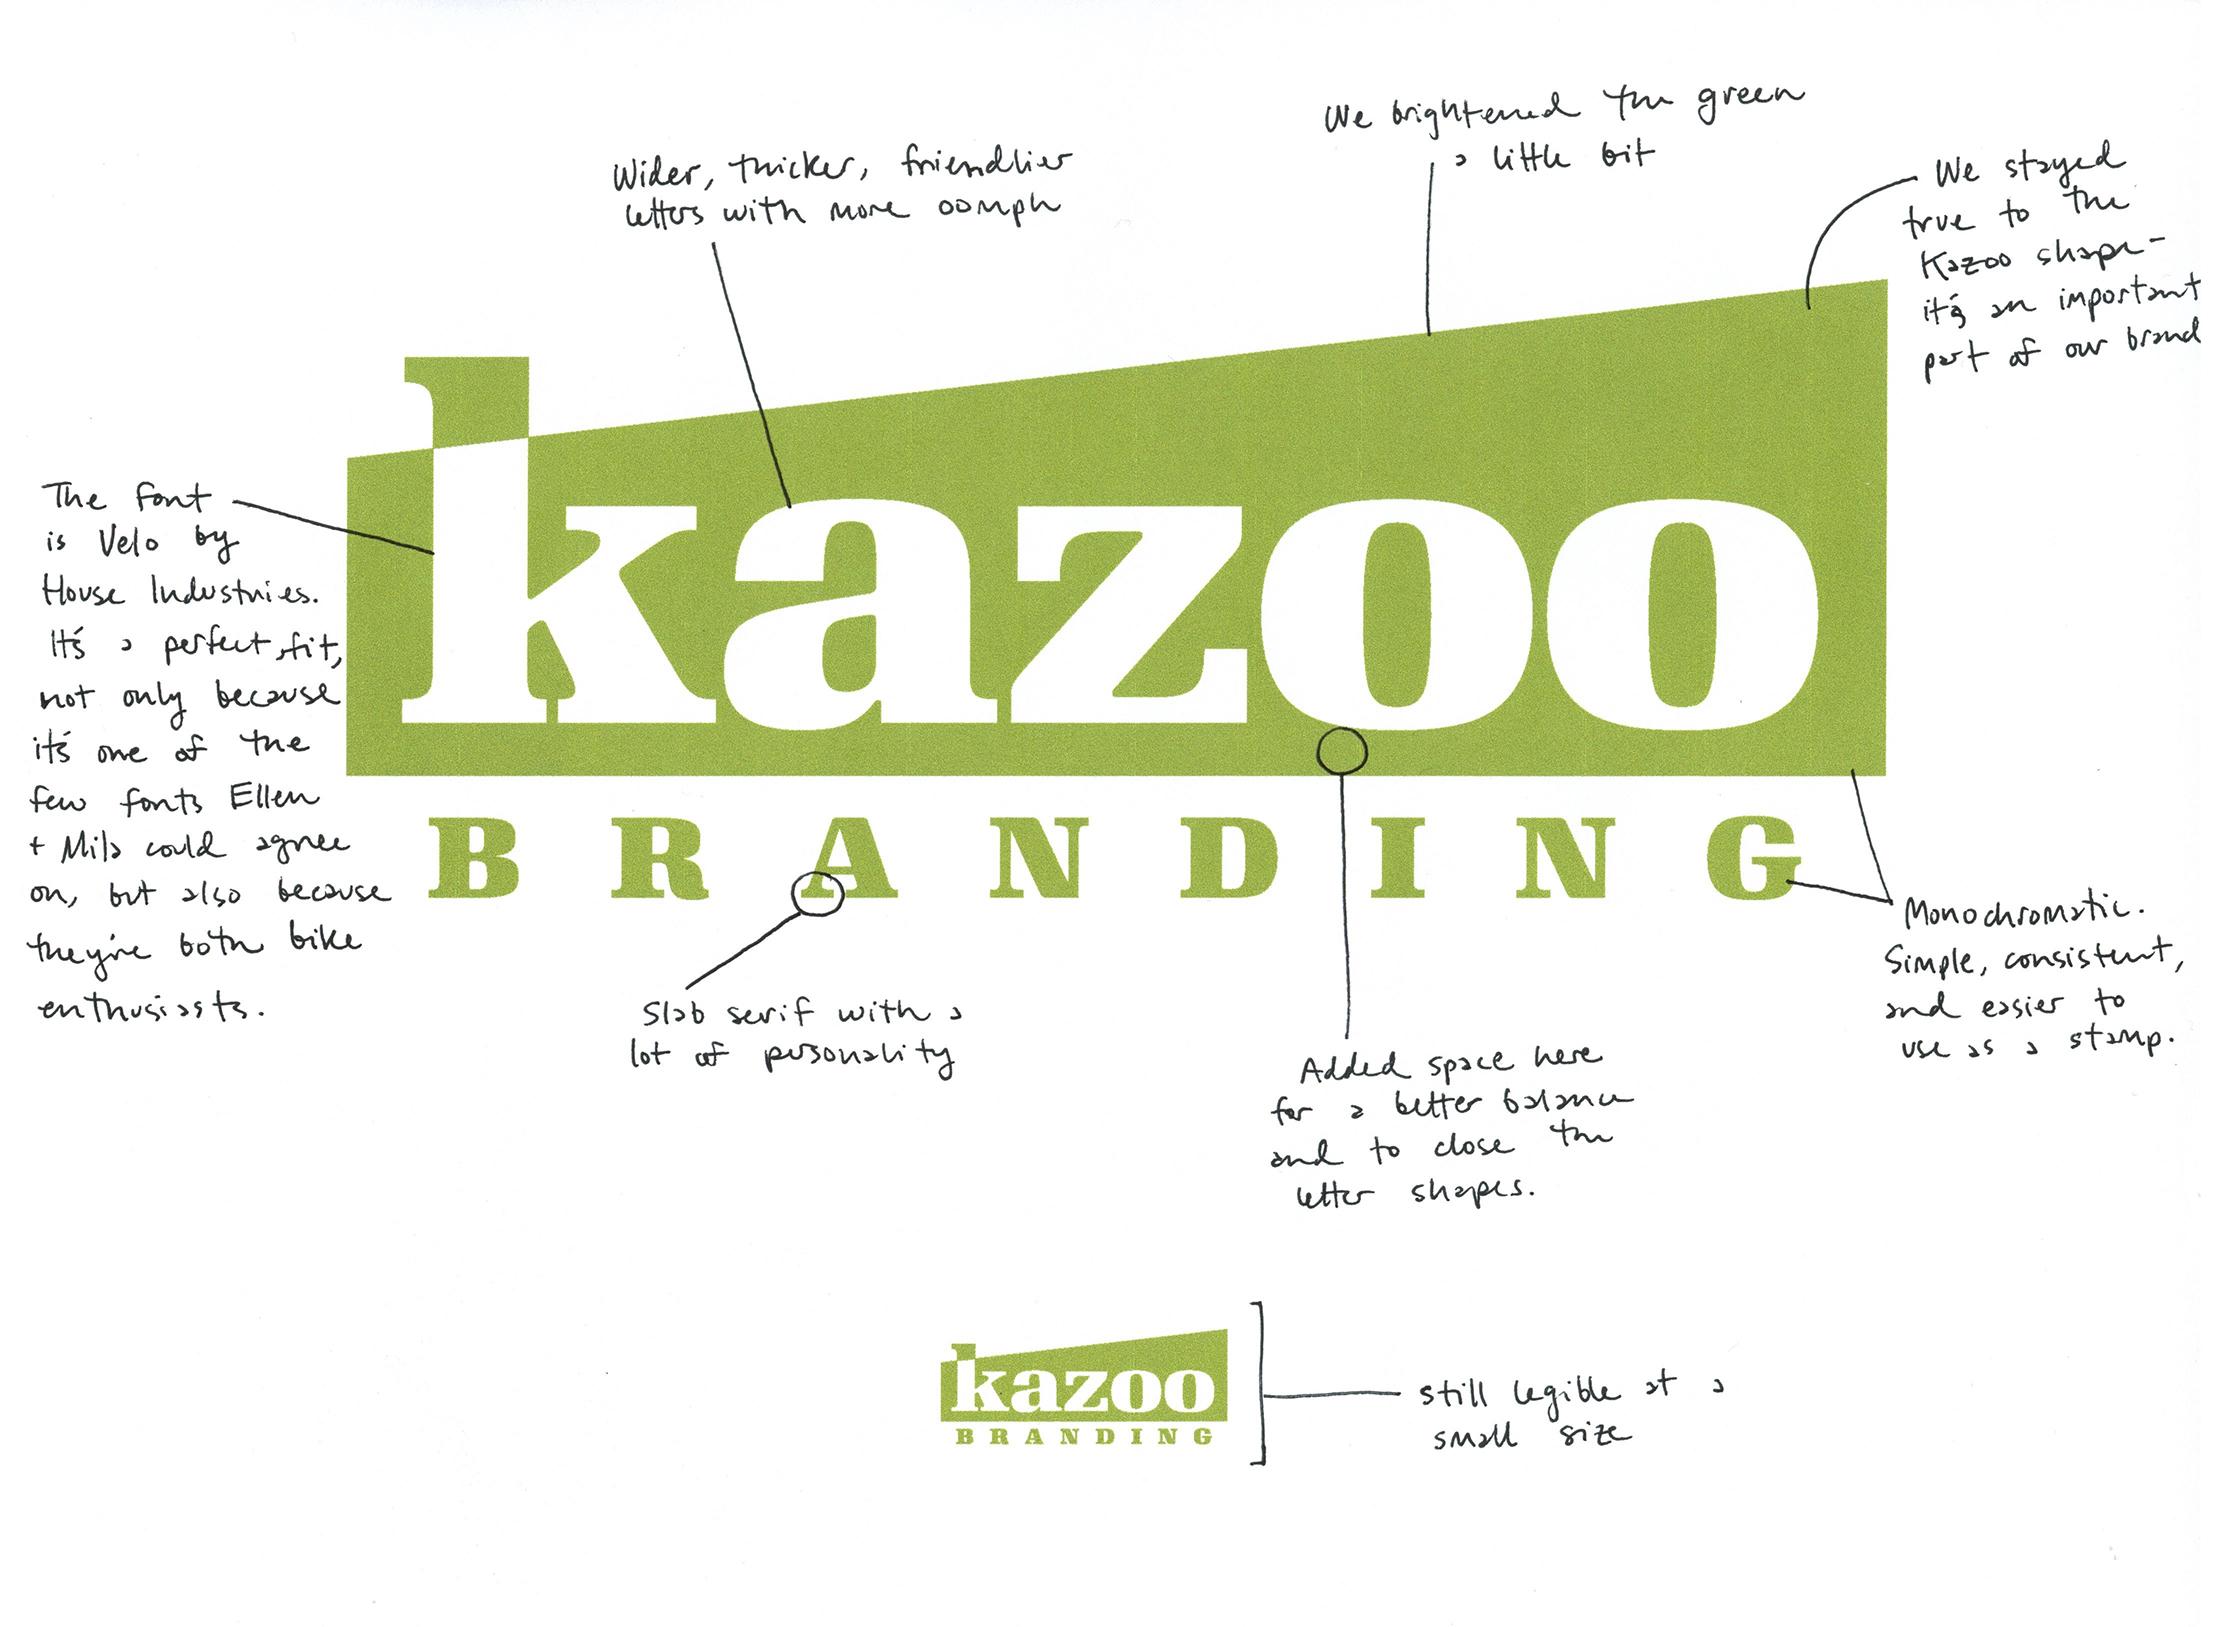 logo-breakdown.jpg